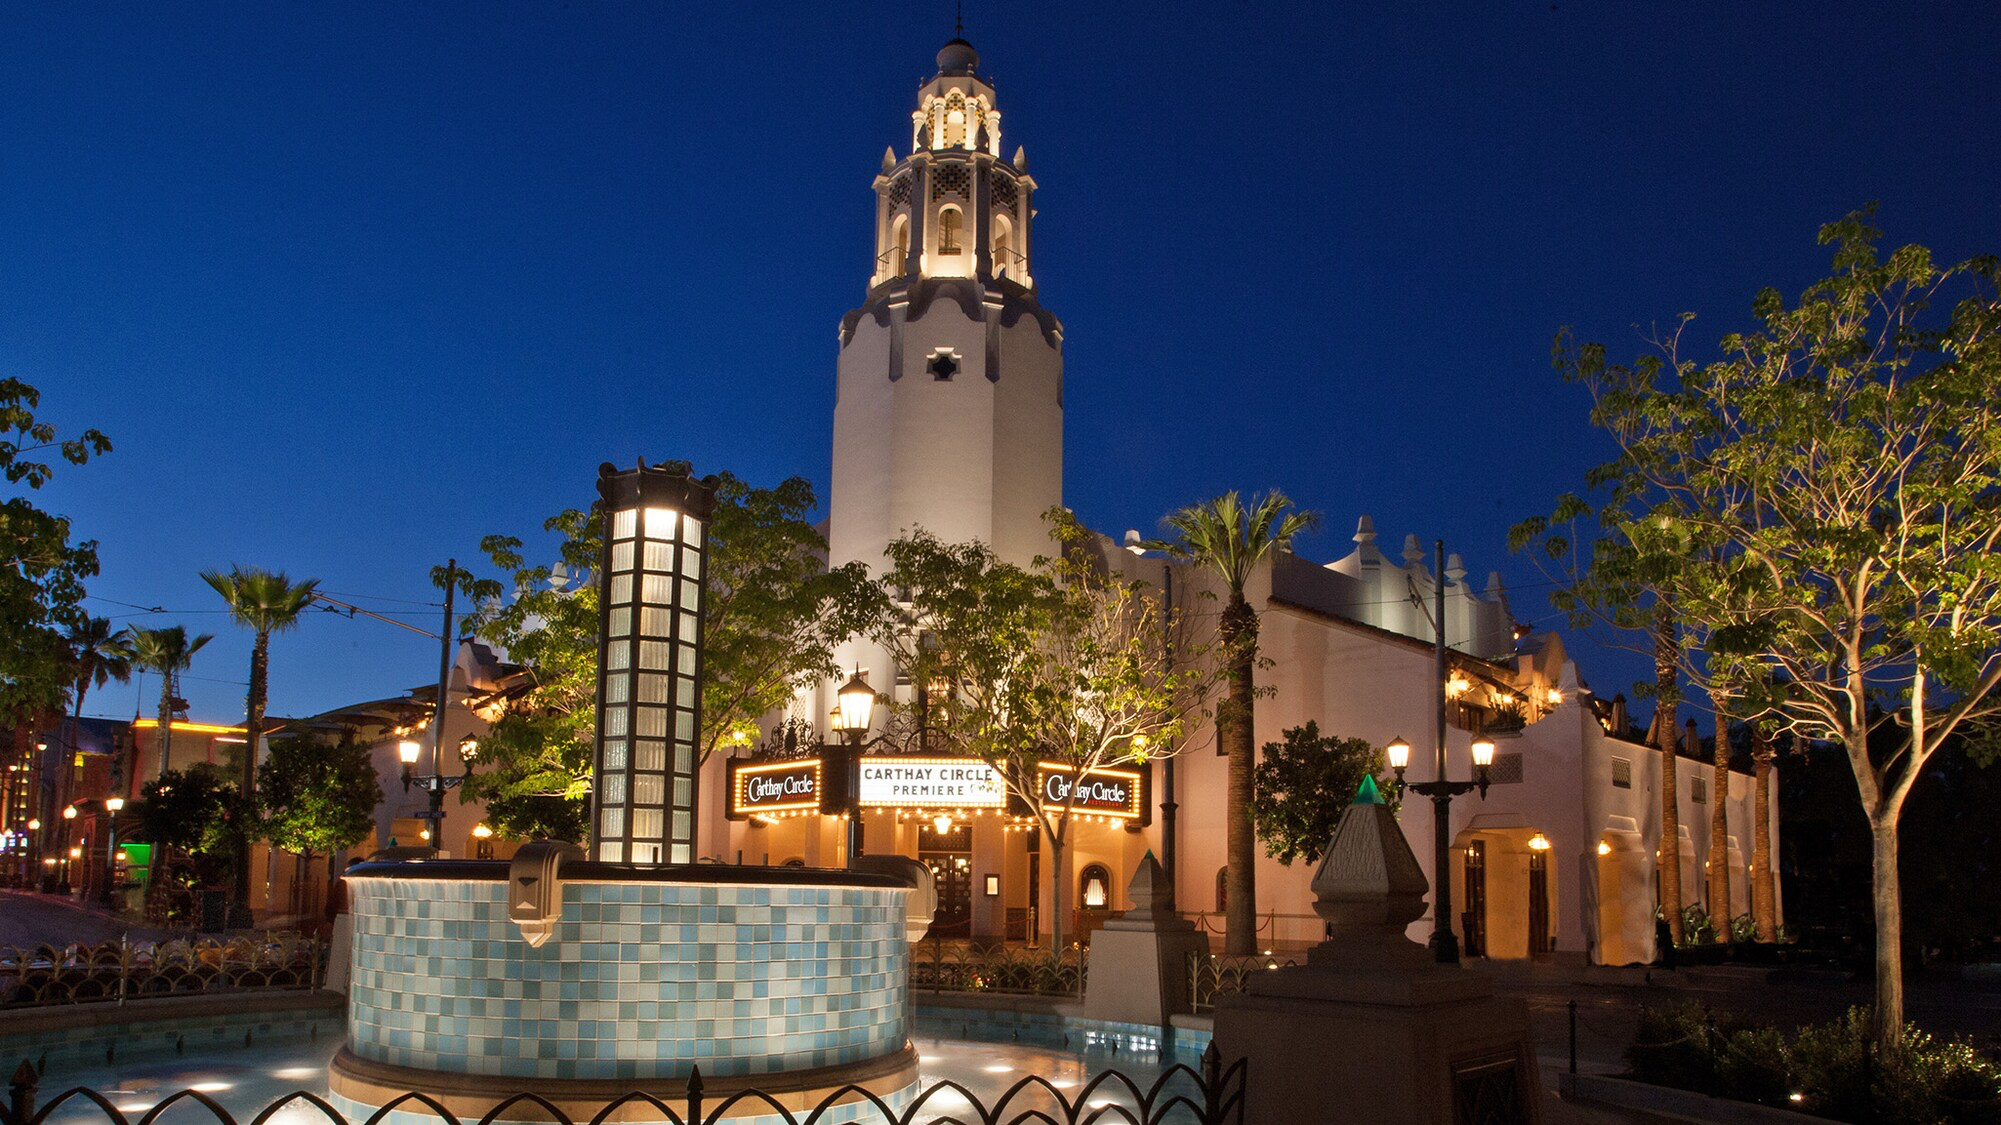 Carthay Circle Restaurant Refurbishment Scheduled for January 2020 at Disney California Adventure